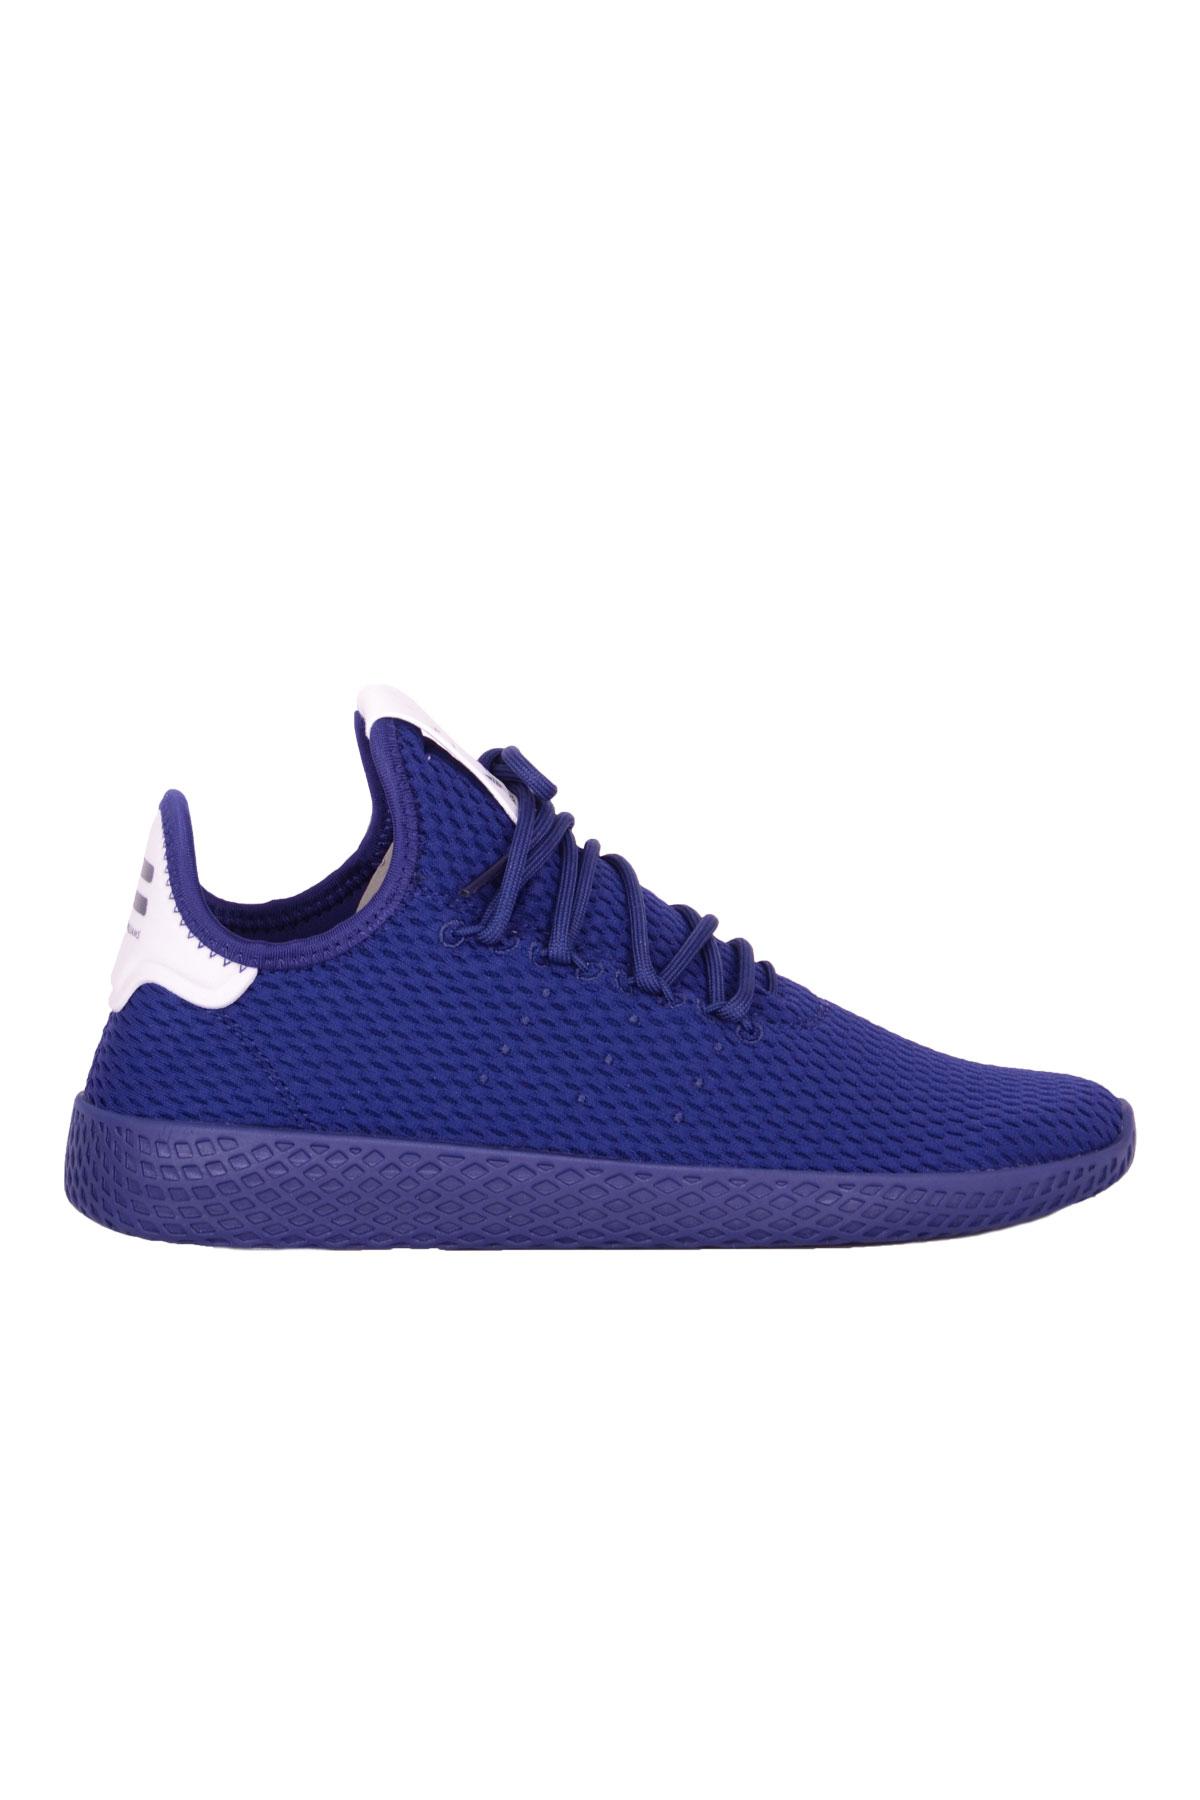 brand new 8be03 4101f SNEAKERS  PH TENNIS HU  ADIDAS     BY8719DARK BLUE